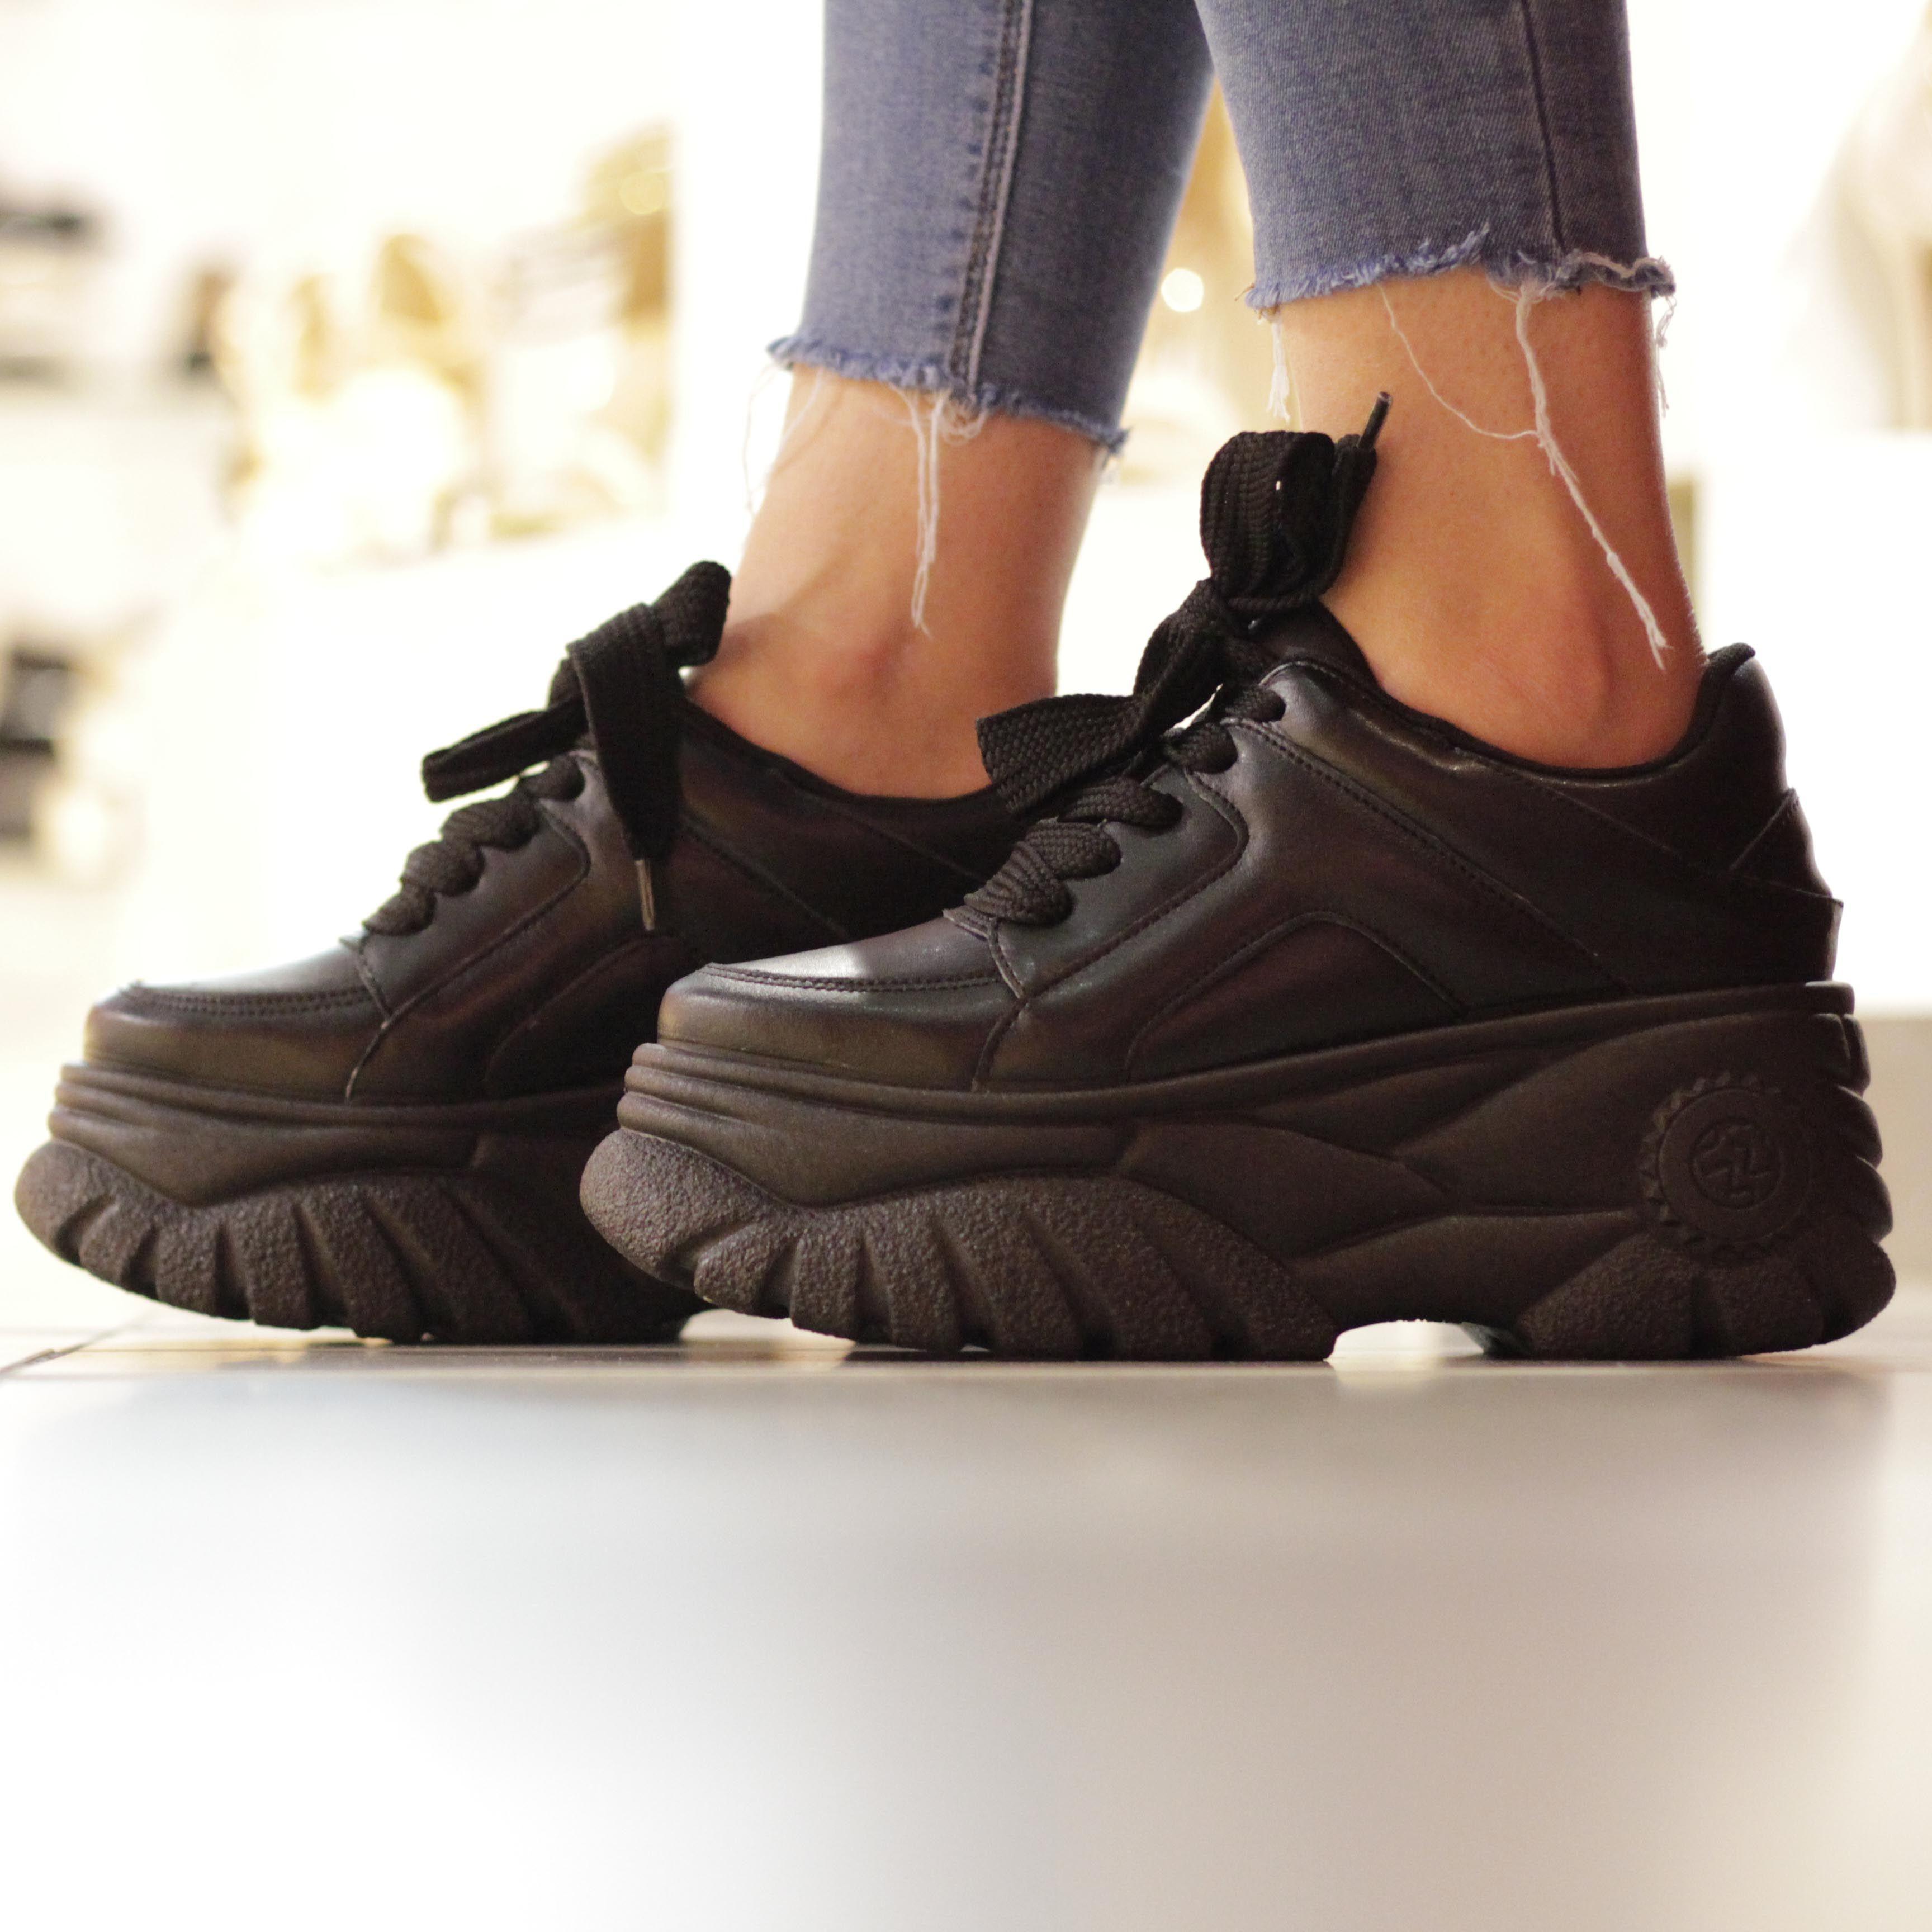 Chunky black platform trainers - get